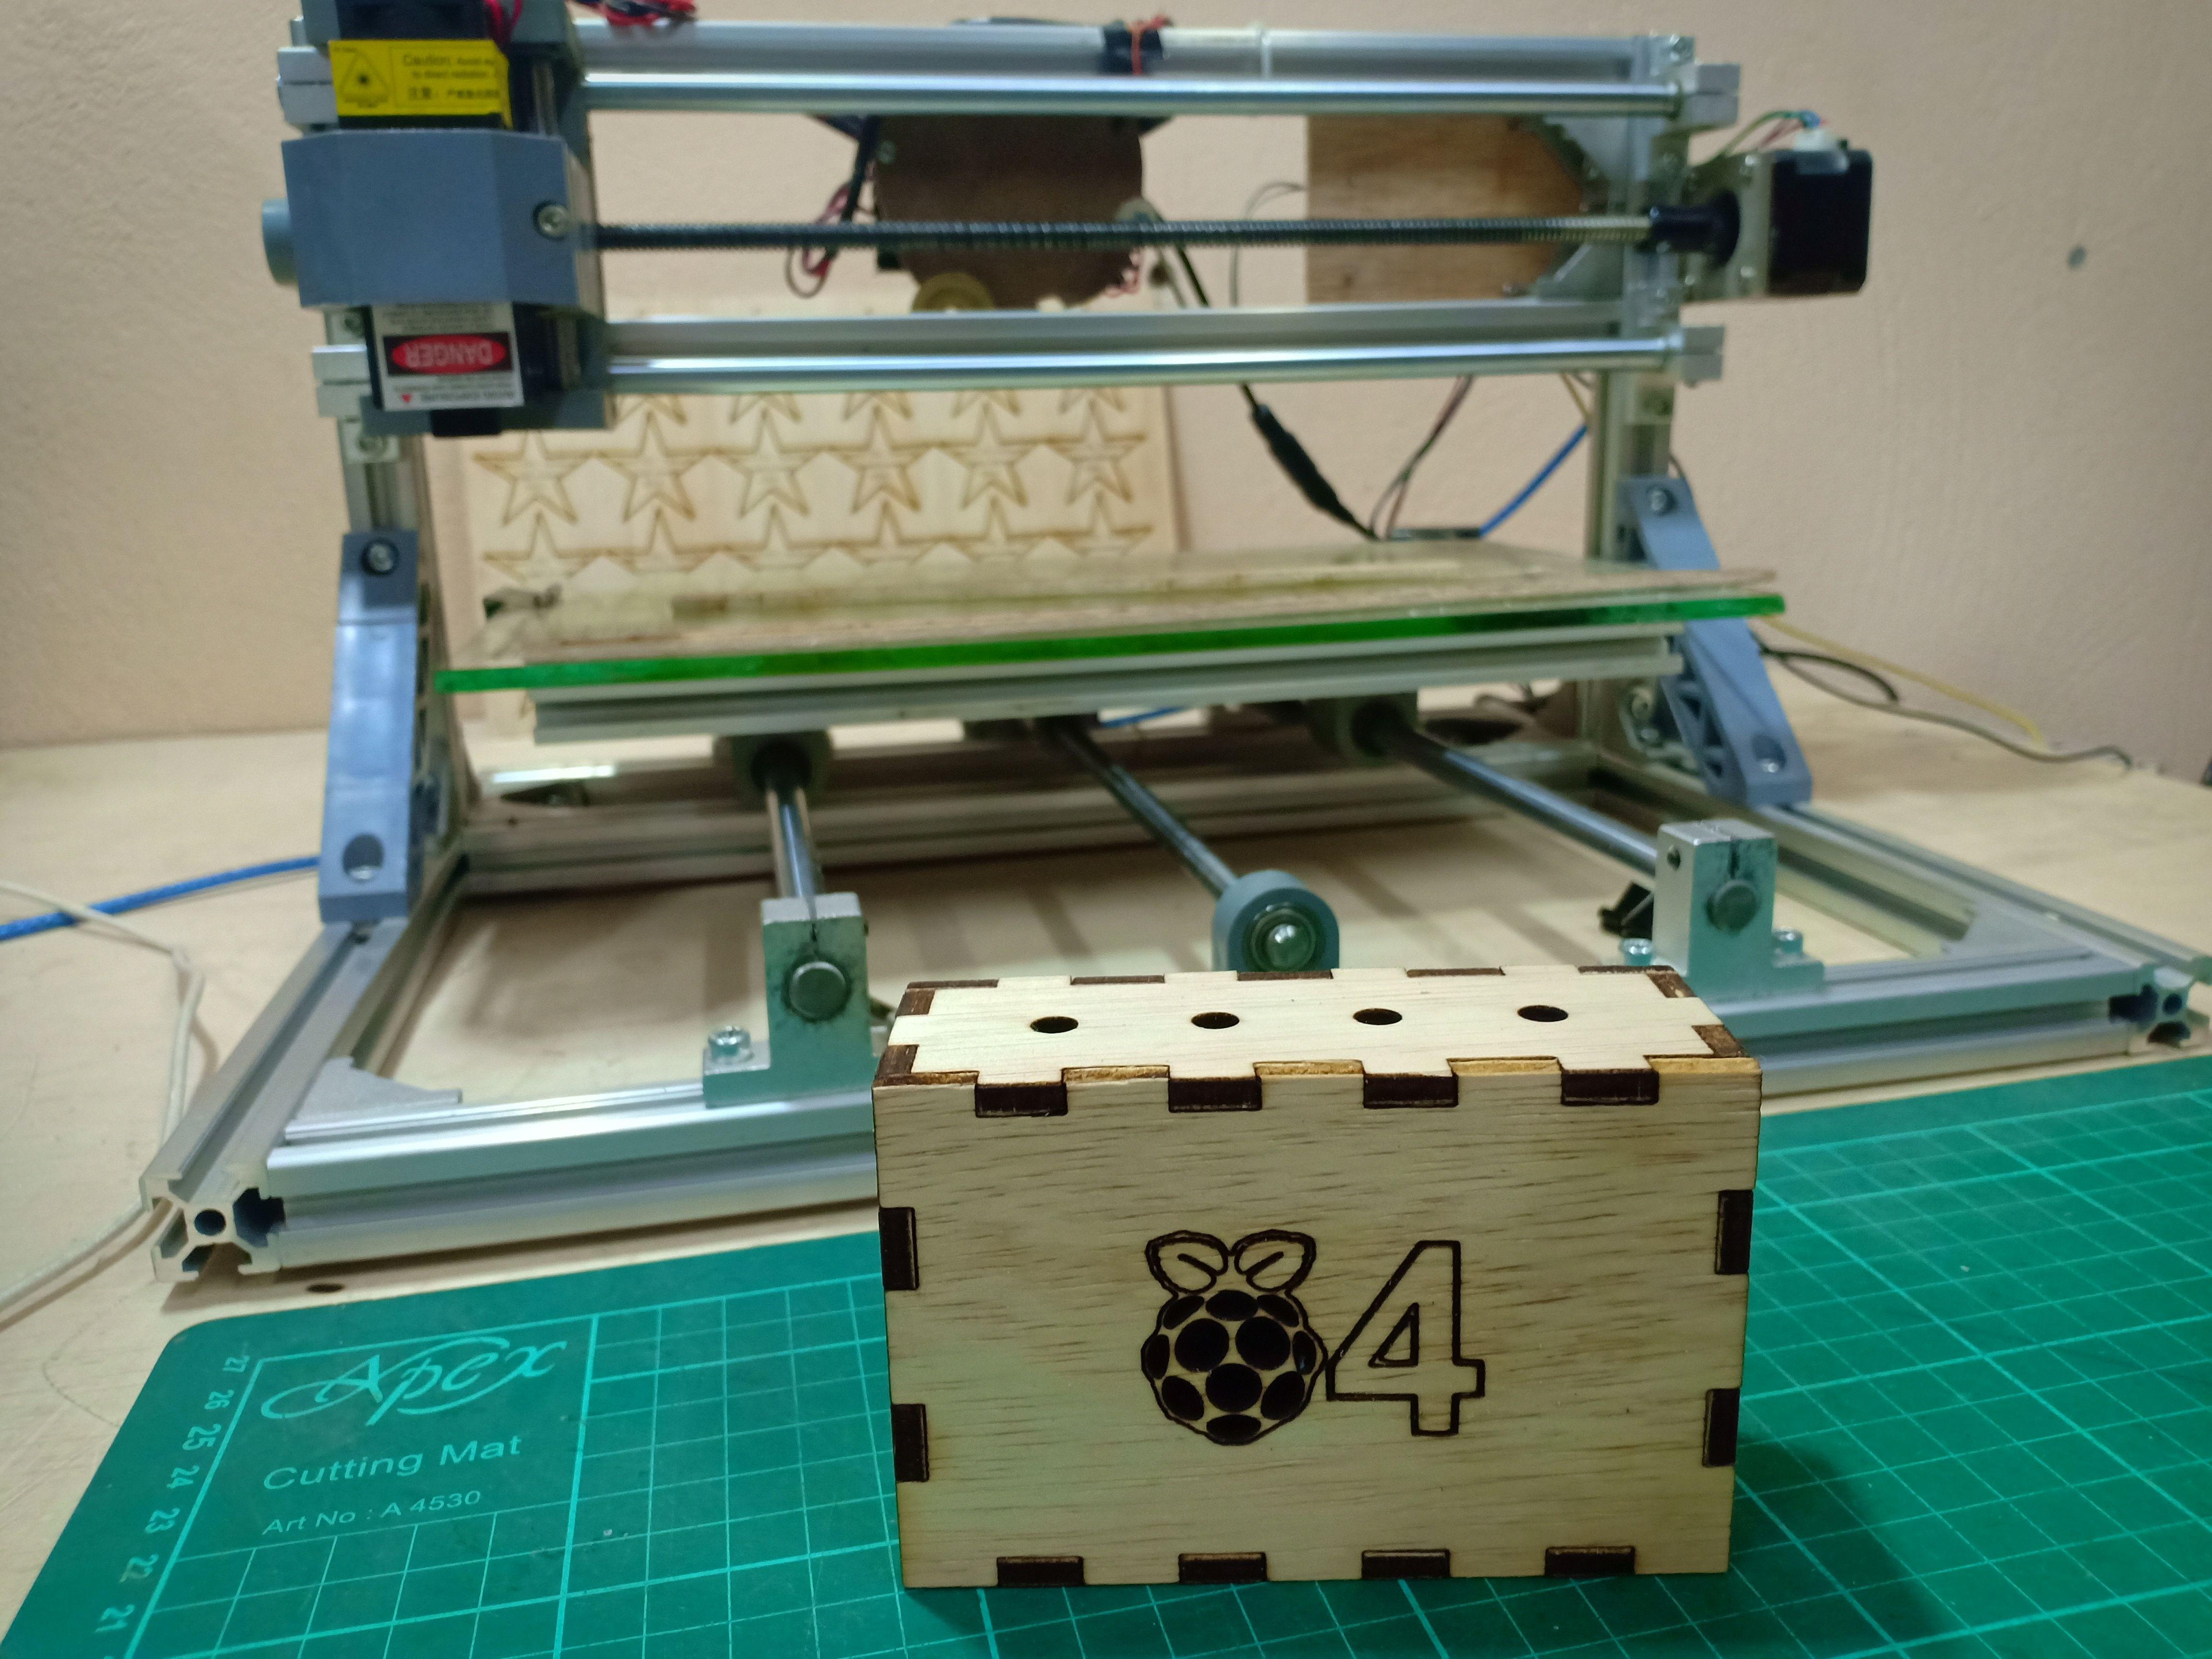 Diy Cnc 3018 Small Cnc Machine Diy Cnc Cnc Projects